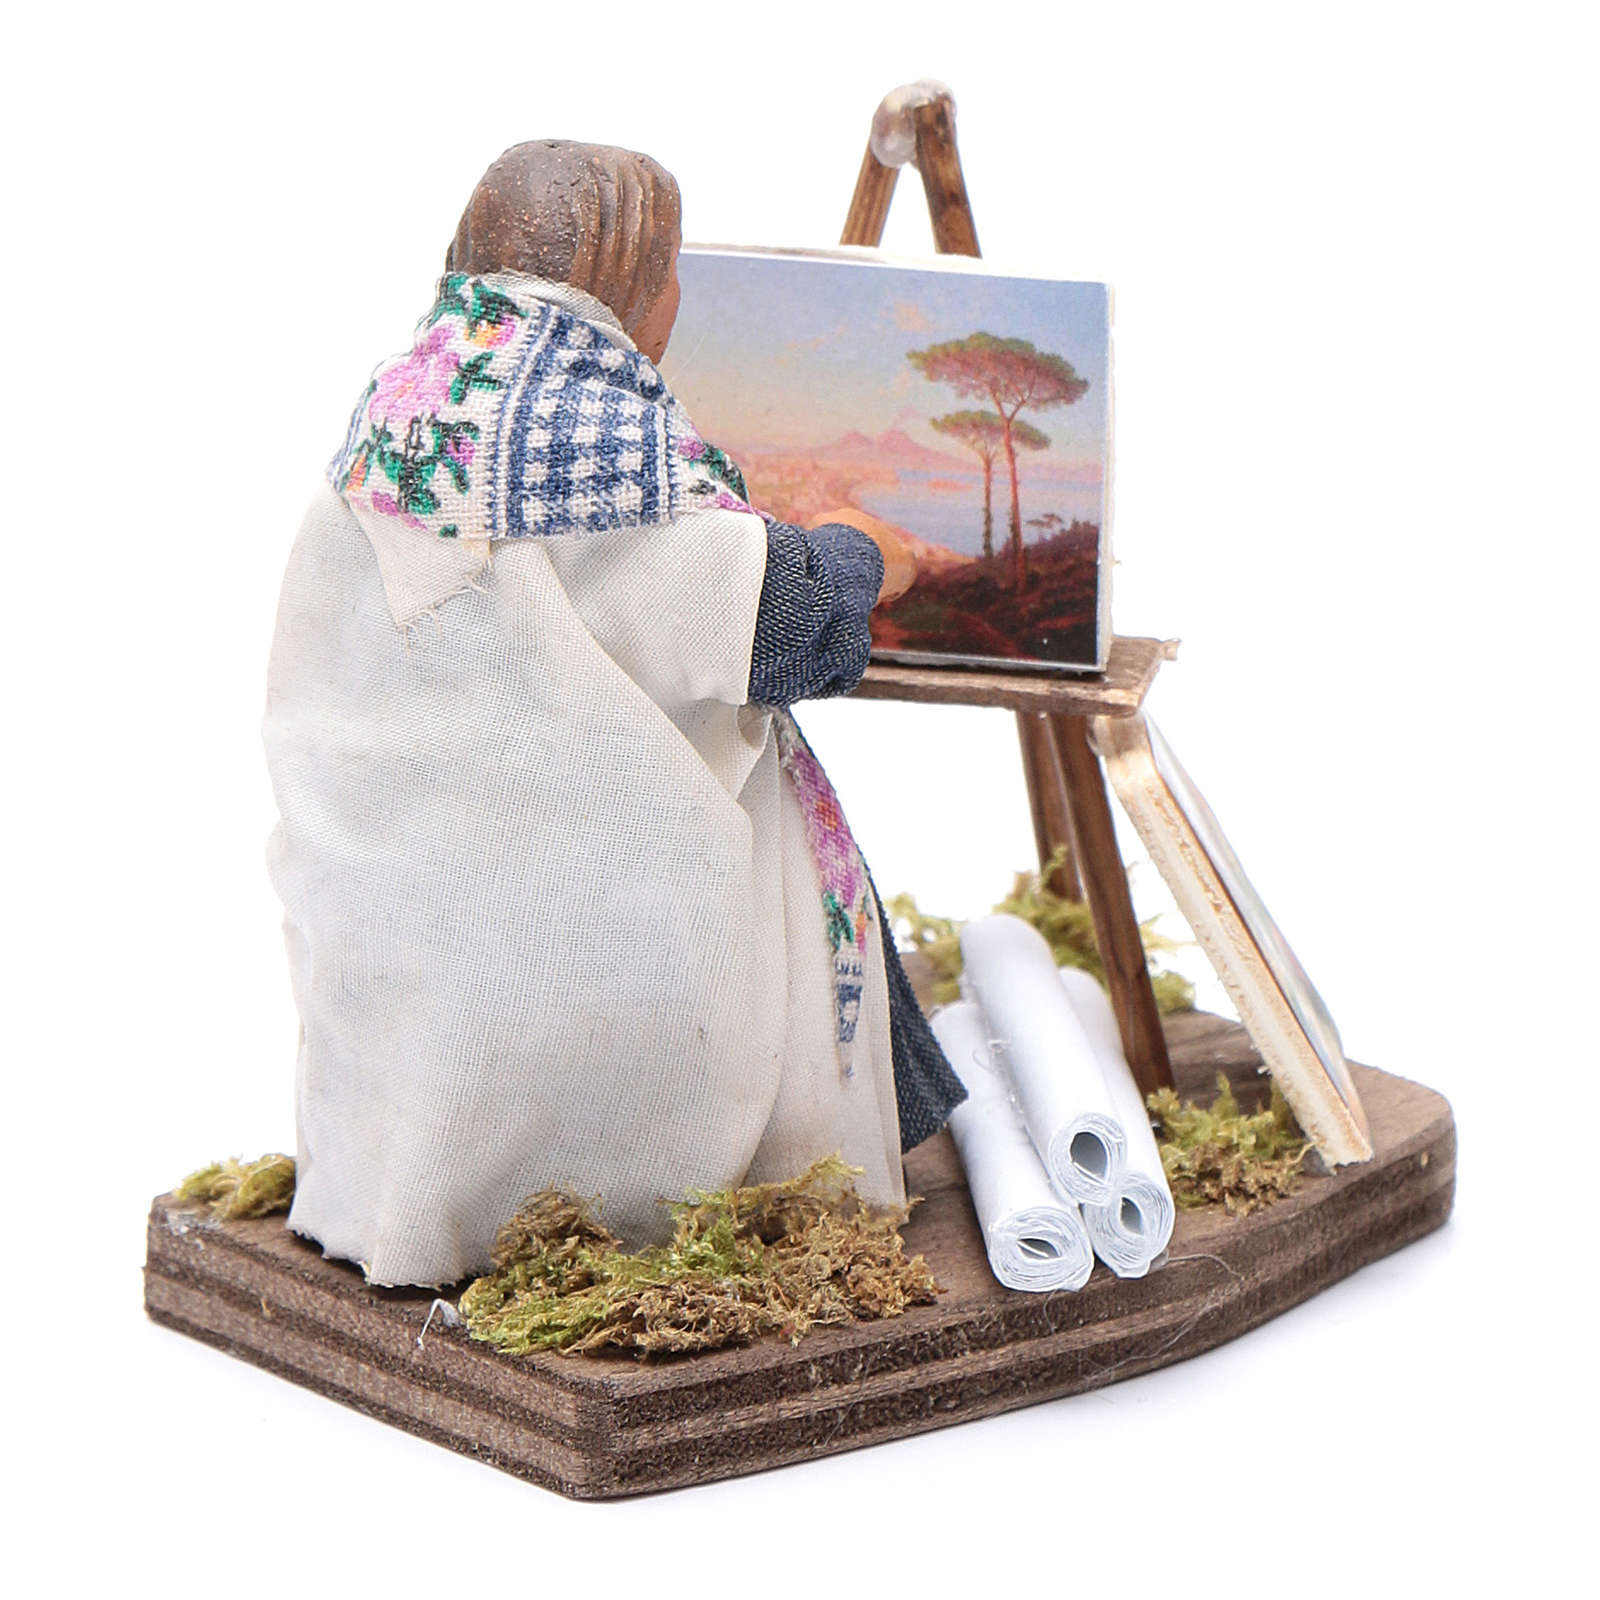 Woman painting, Neapolitan nativity figurine 10cm 4